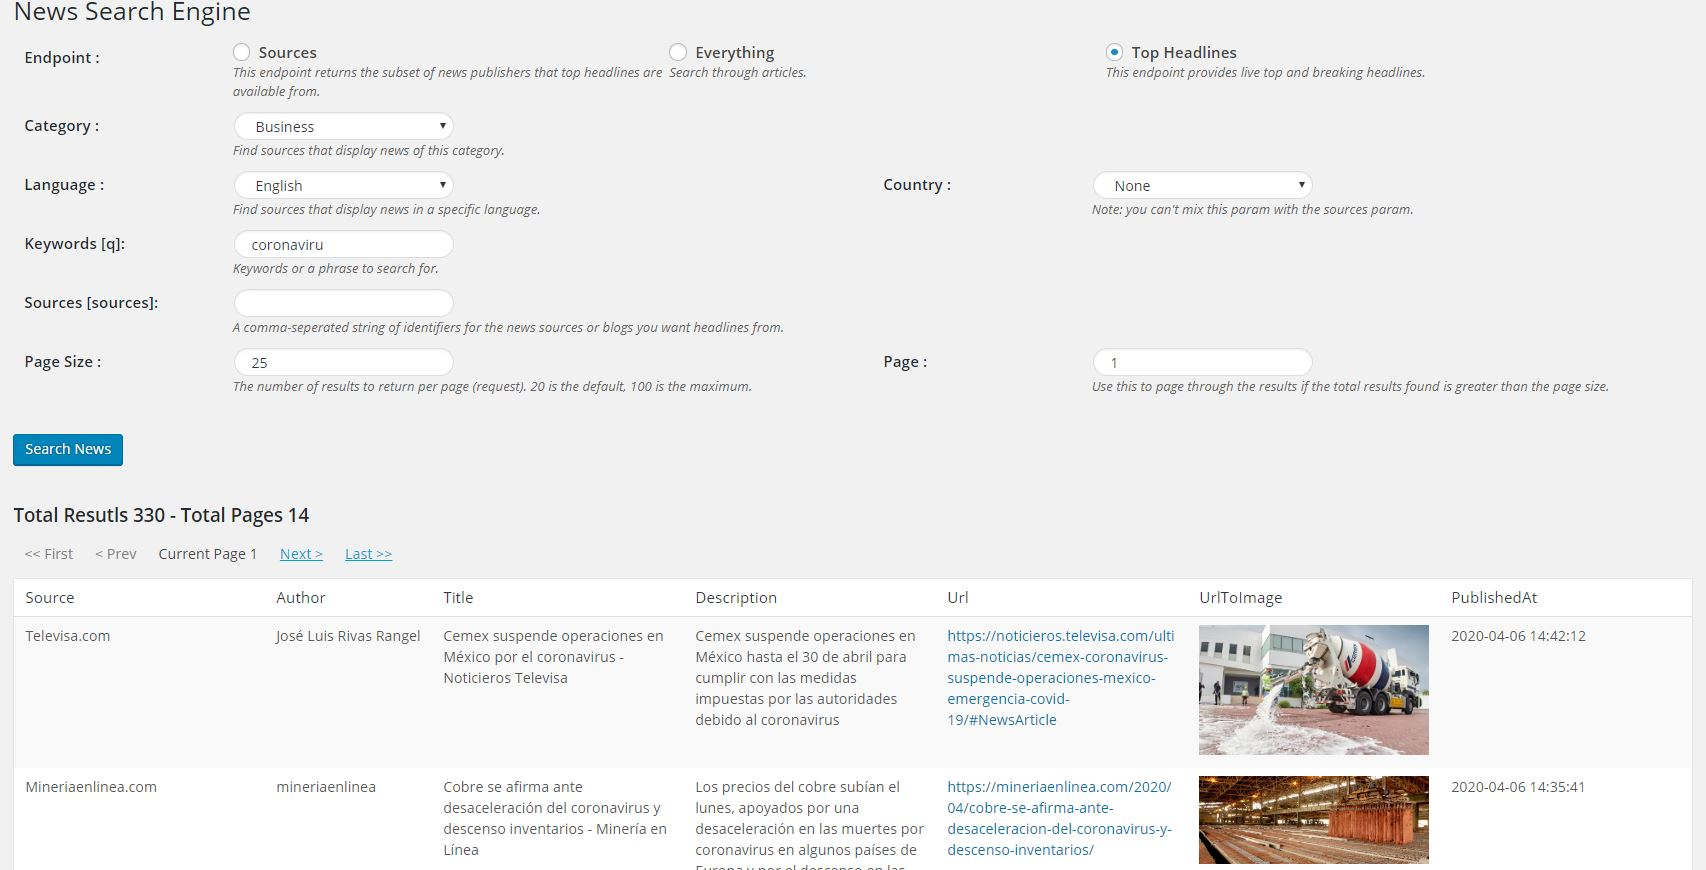 News Search Engine Top Headlines